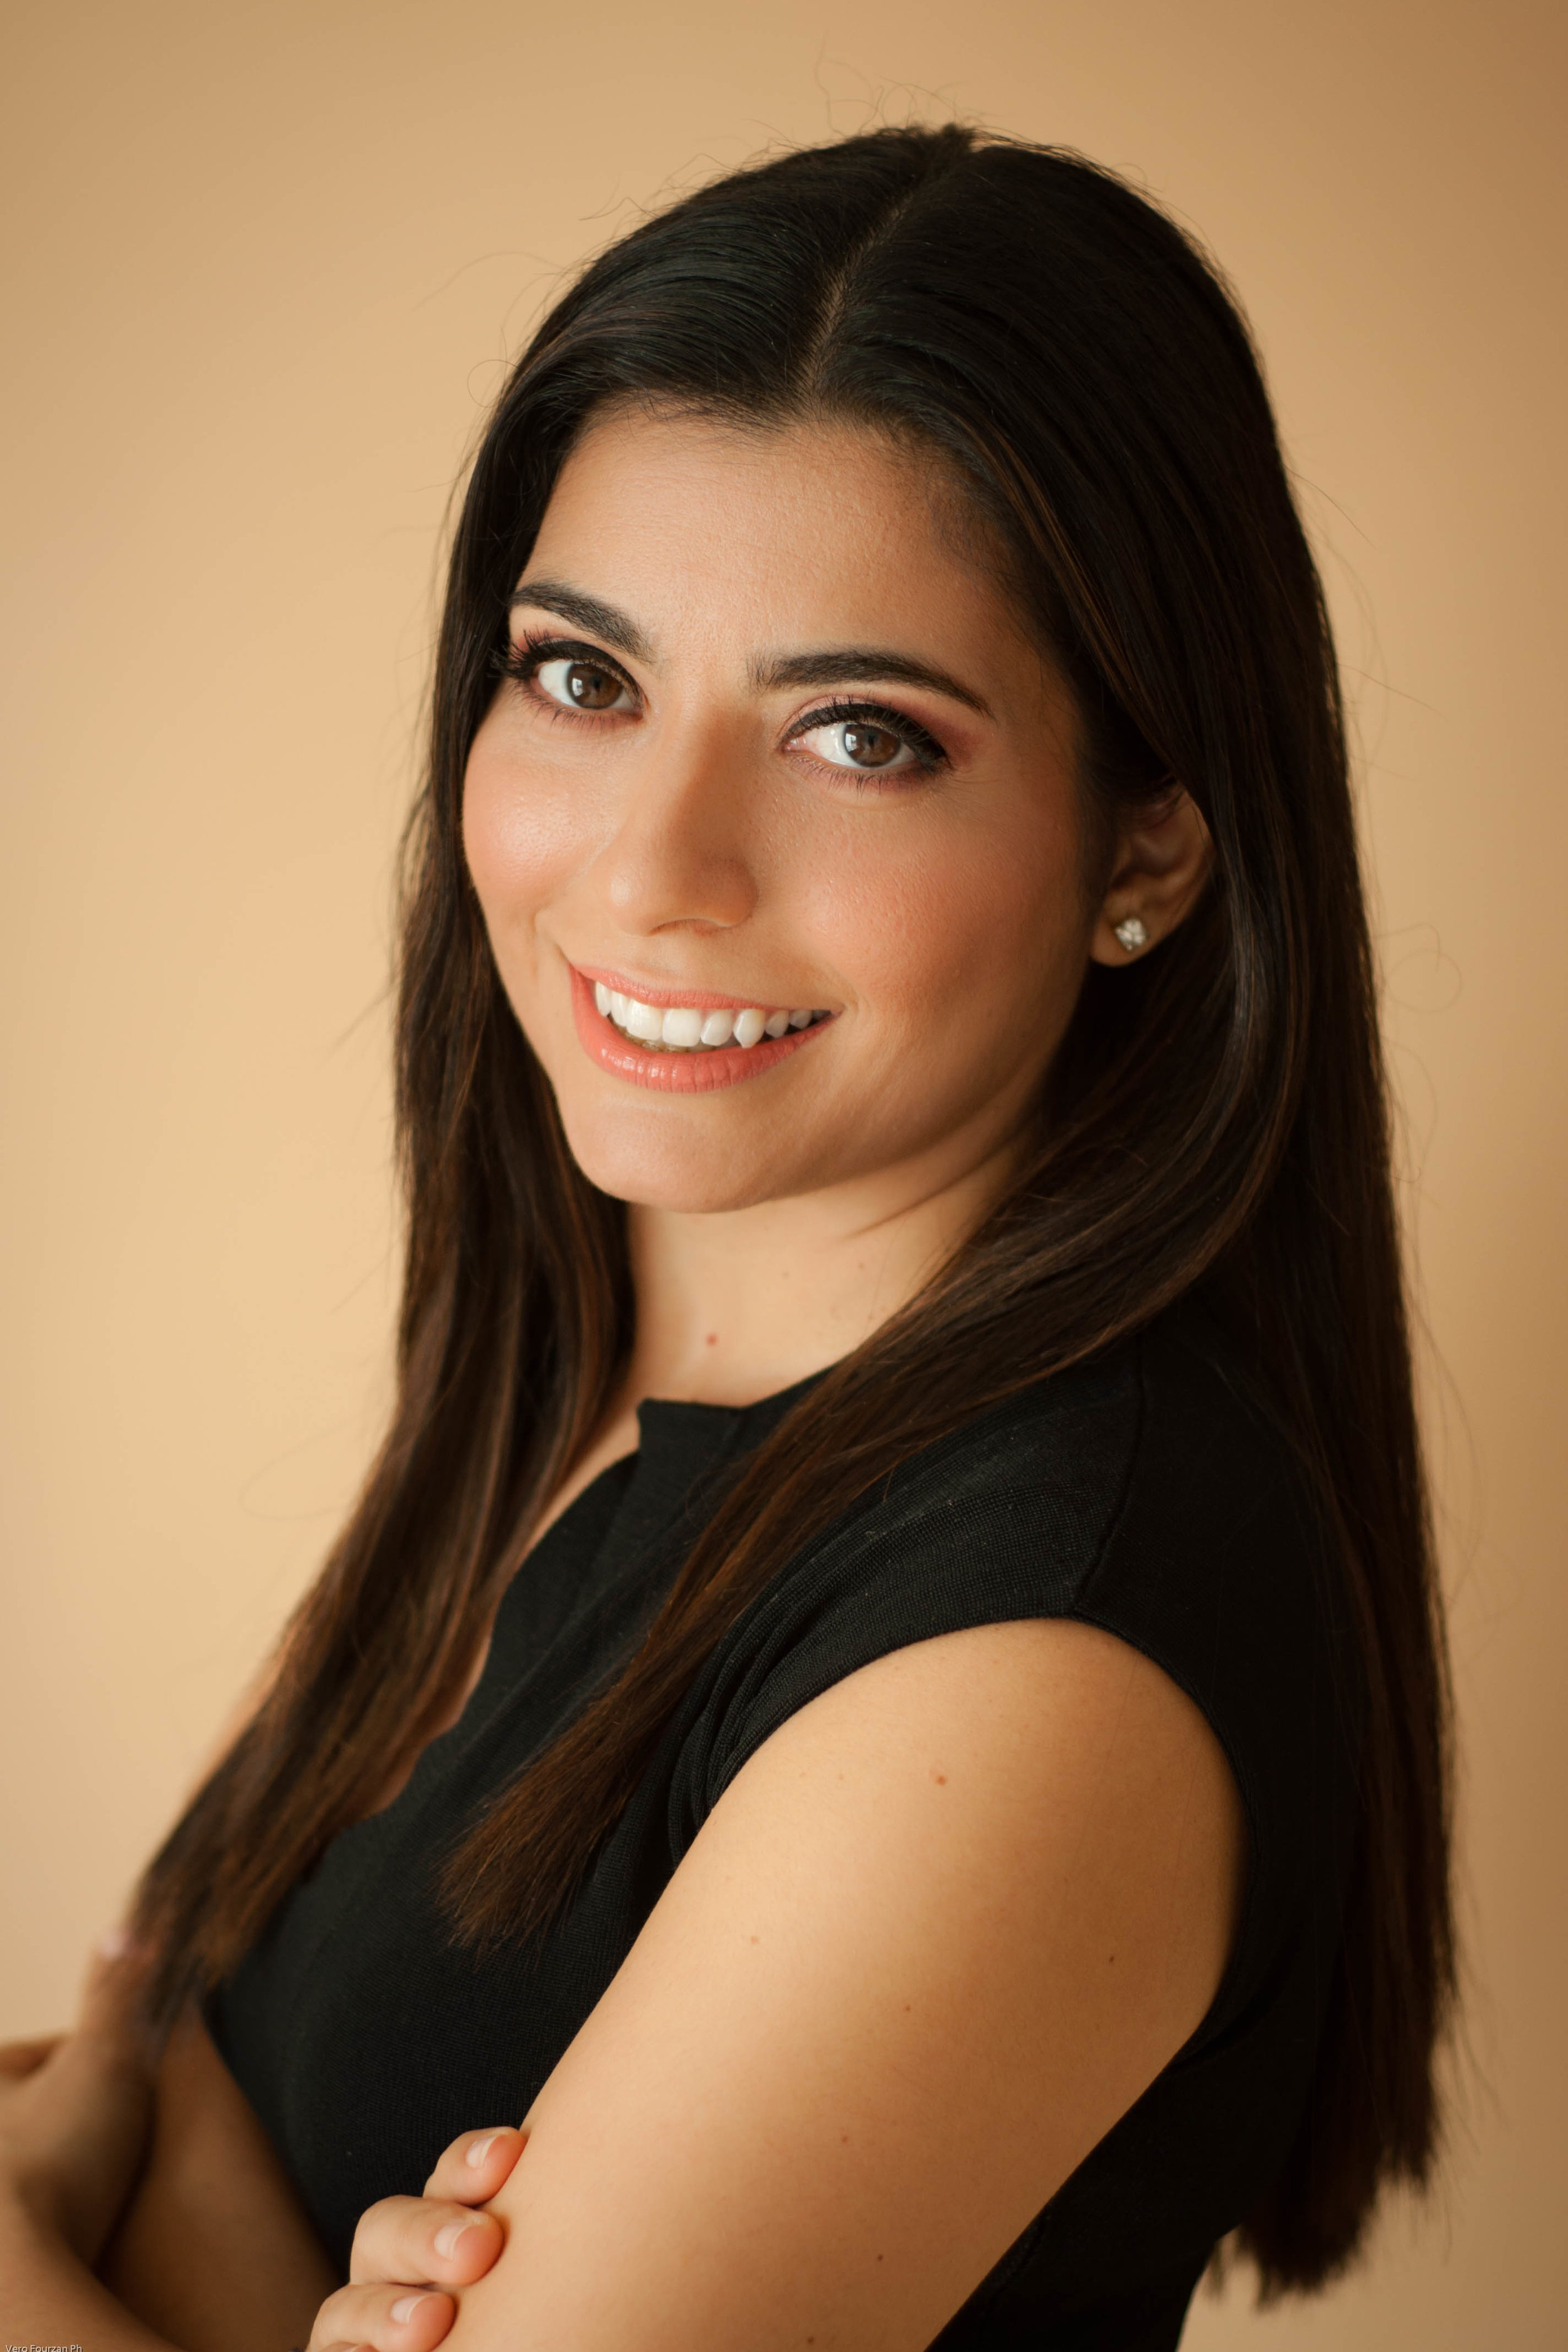 Ana Selva - English spoken Real Estate Advisor / Deutsch gesprochener Immobilienberater / Españolana@selvacorealty.com